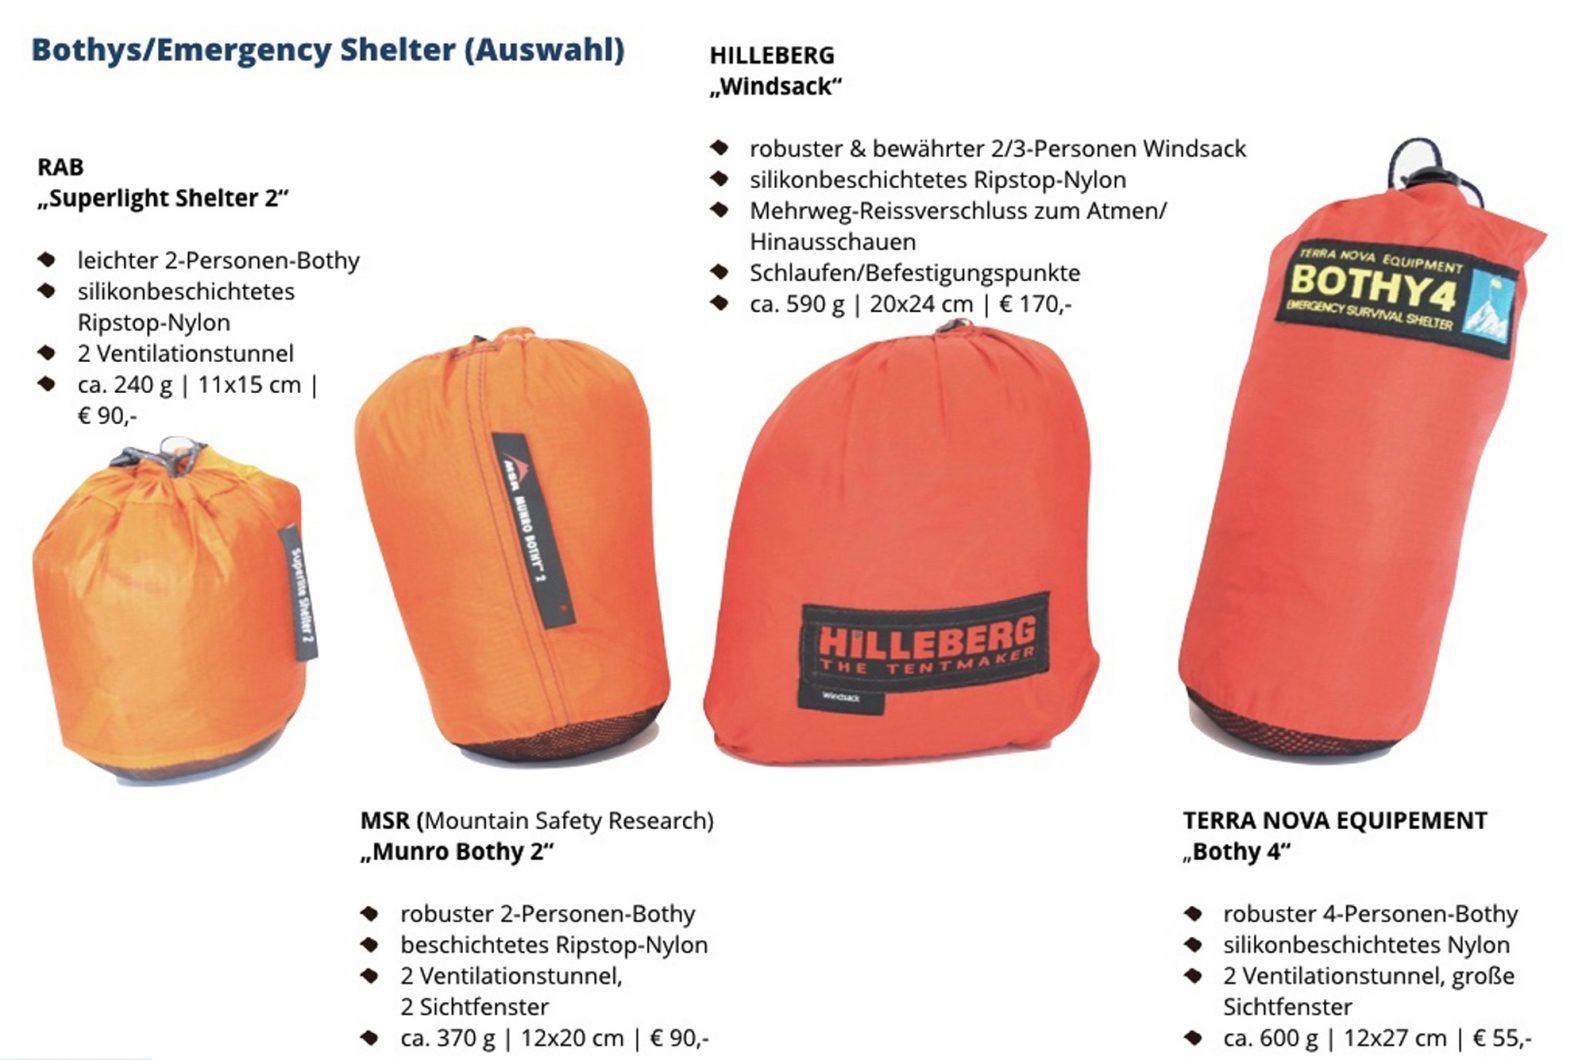 Bothys I Emergency Shelter Biwaksack